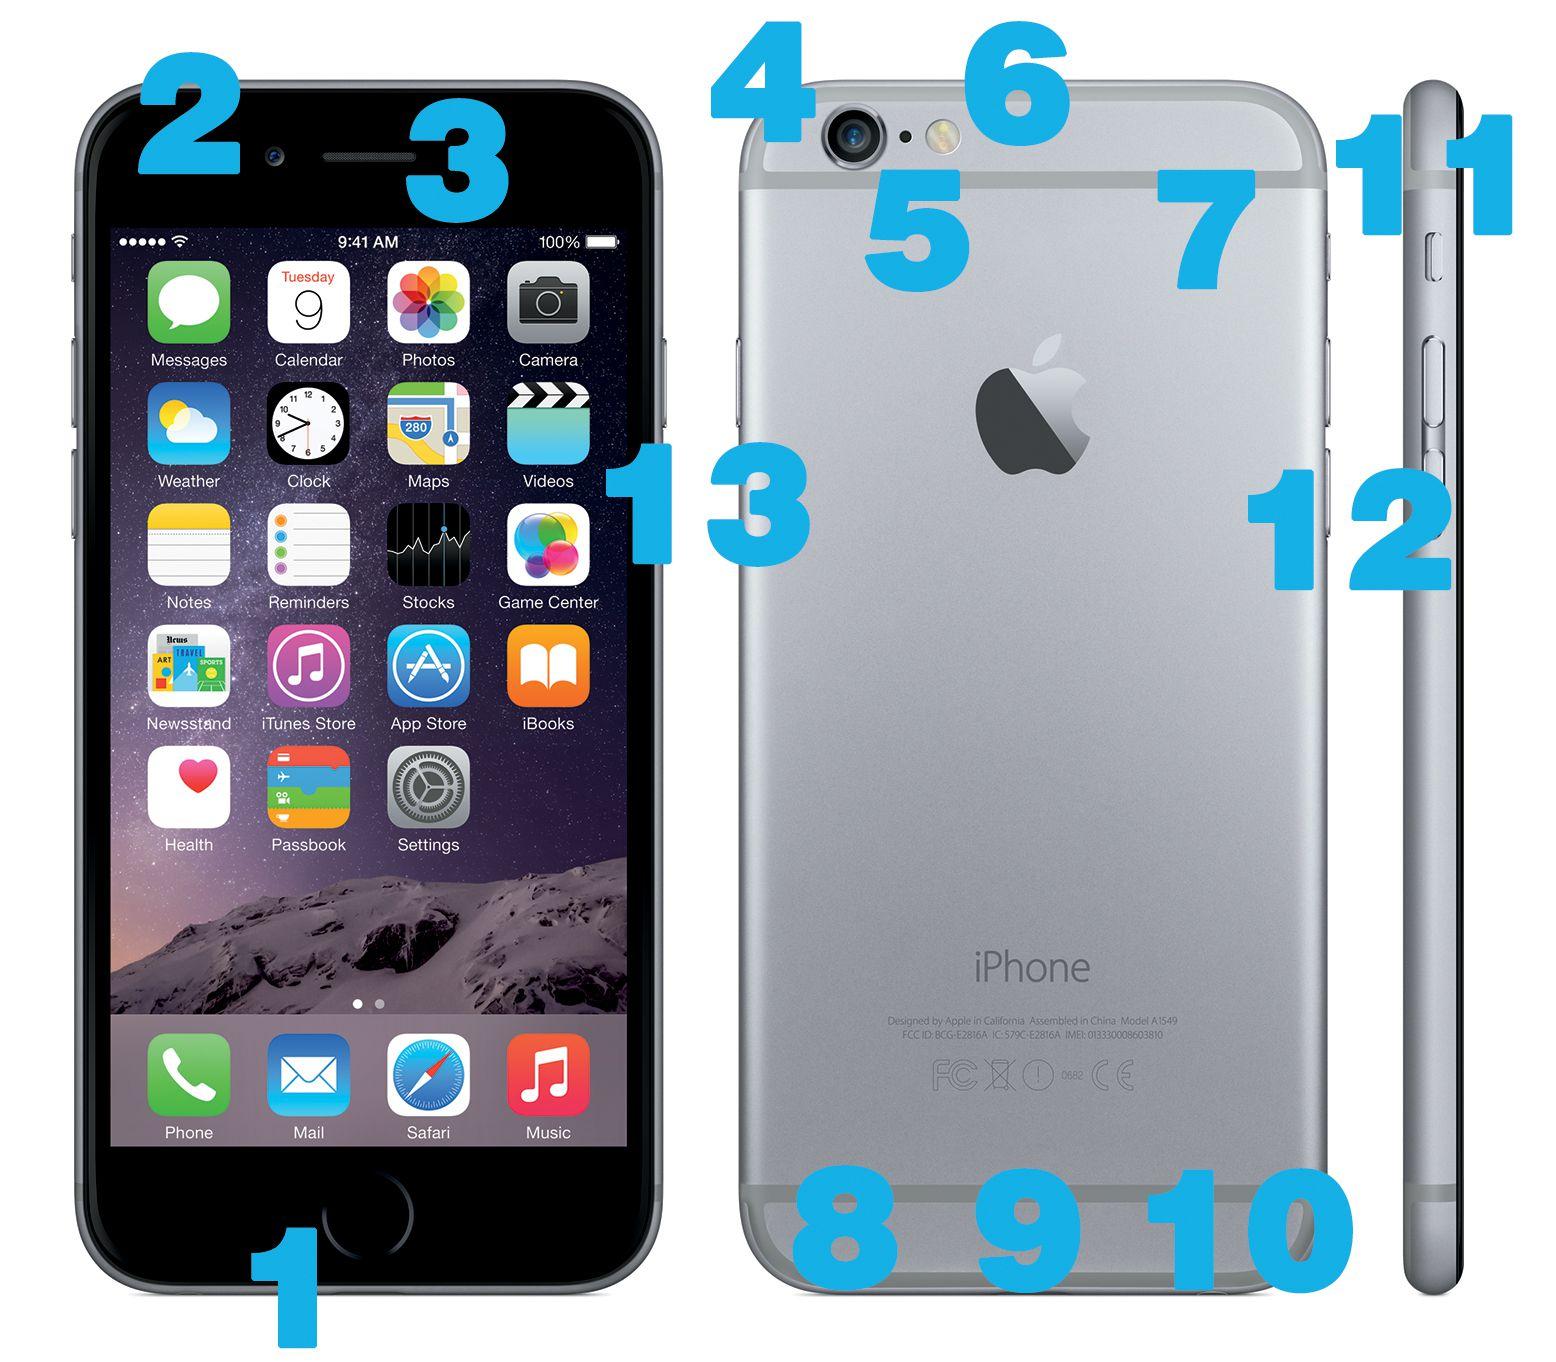 Anatomy Of The Iphone 5s Hardware